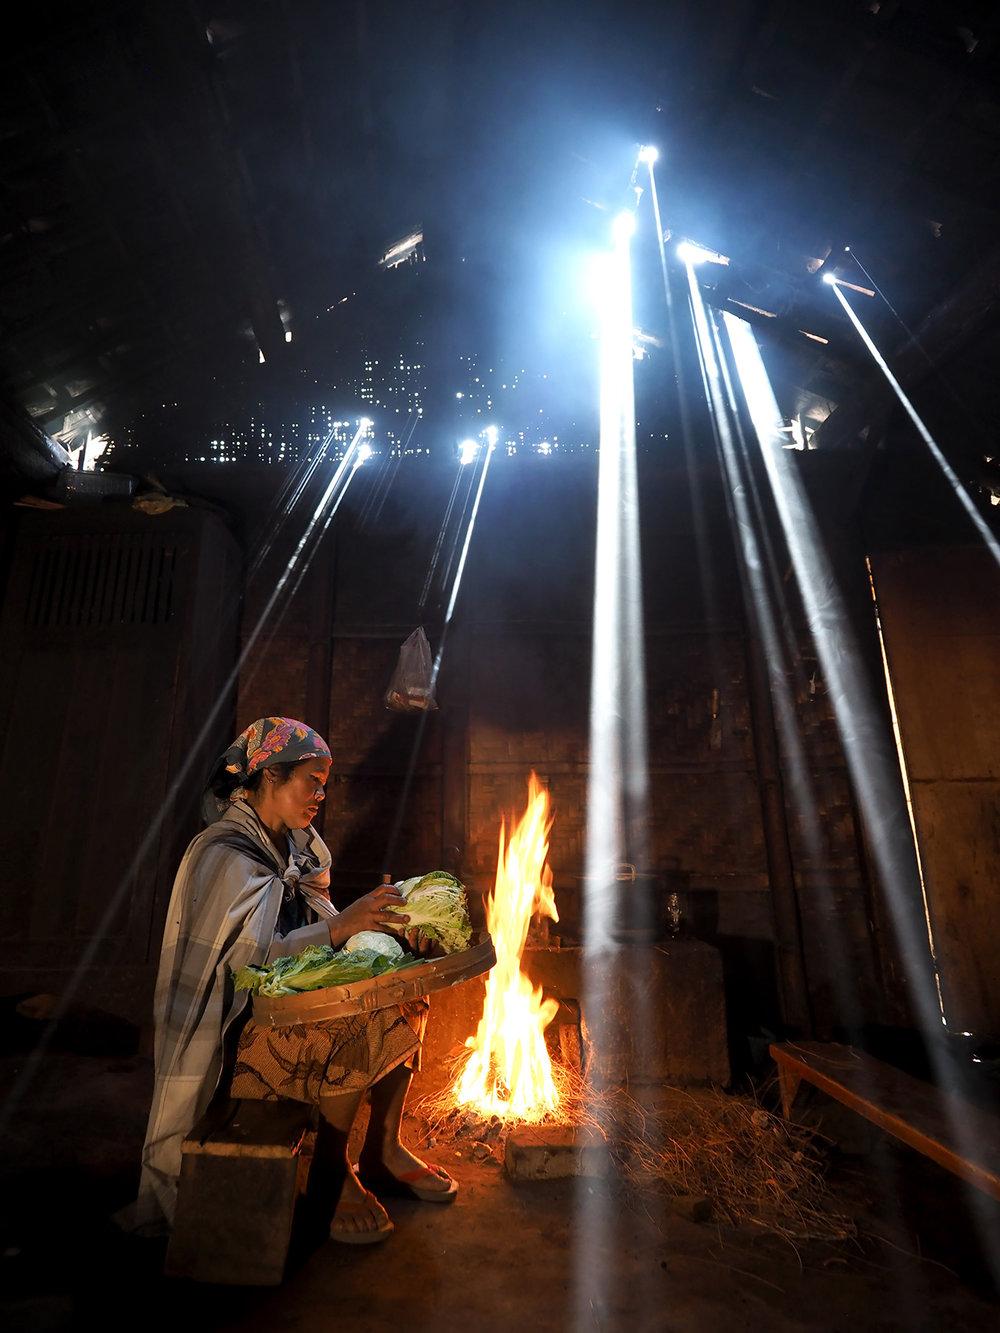 Ranjan_ramchandani_Cooking in a village kitchen.jpg